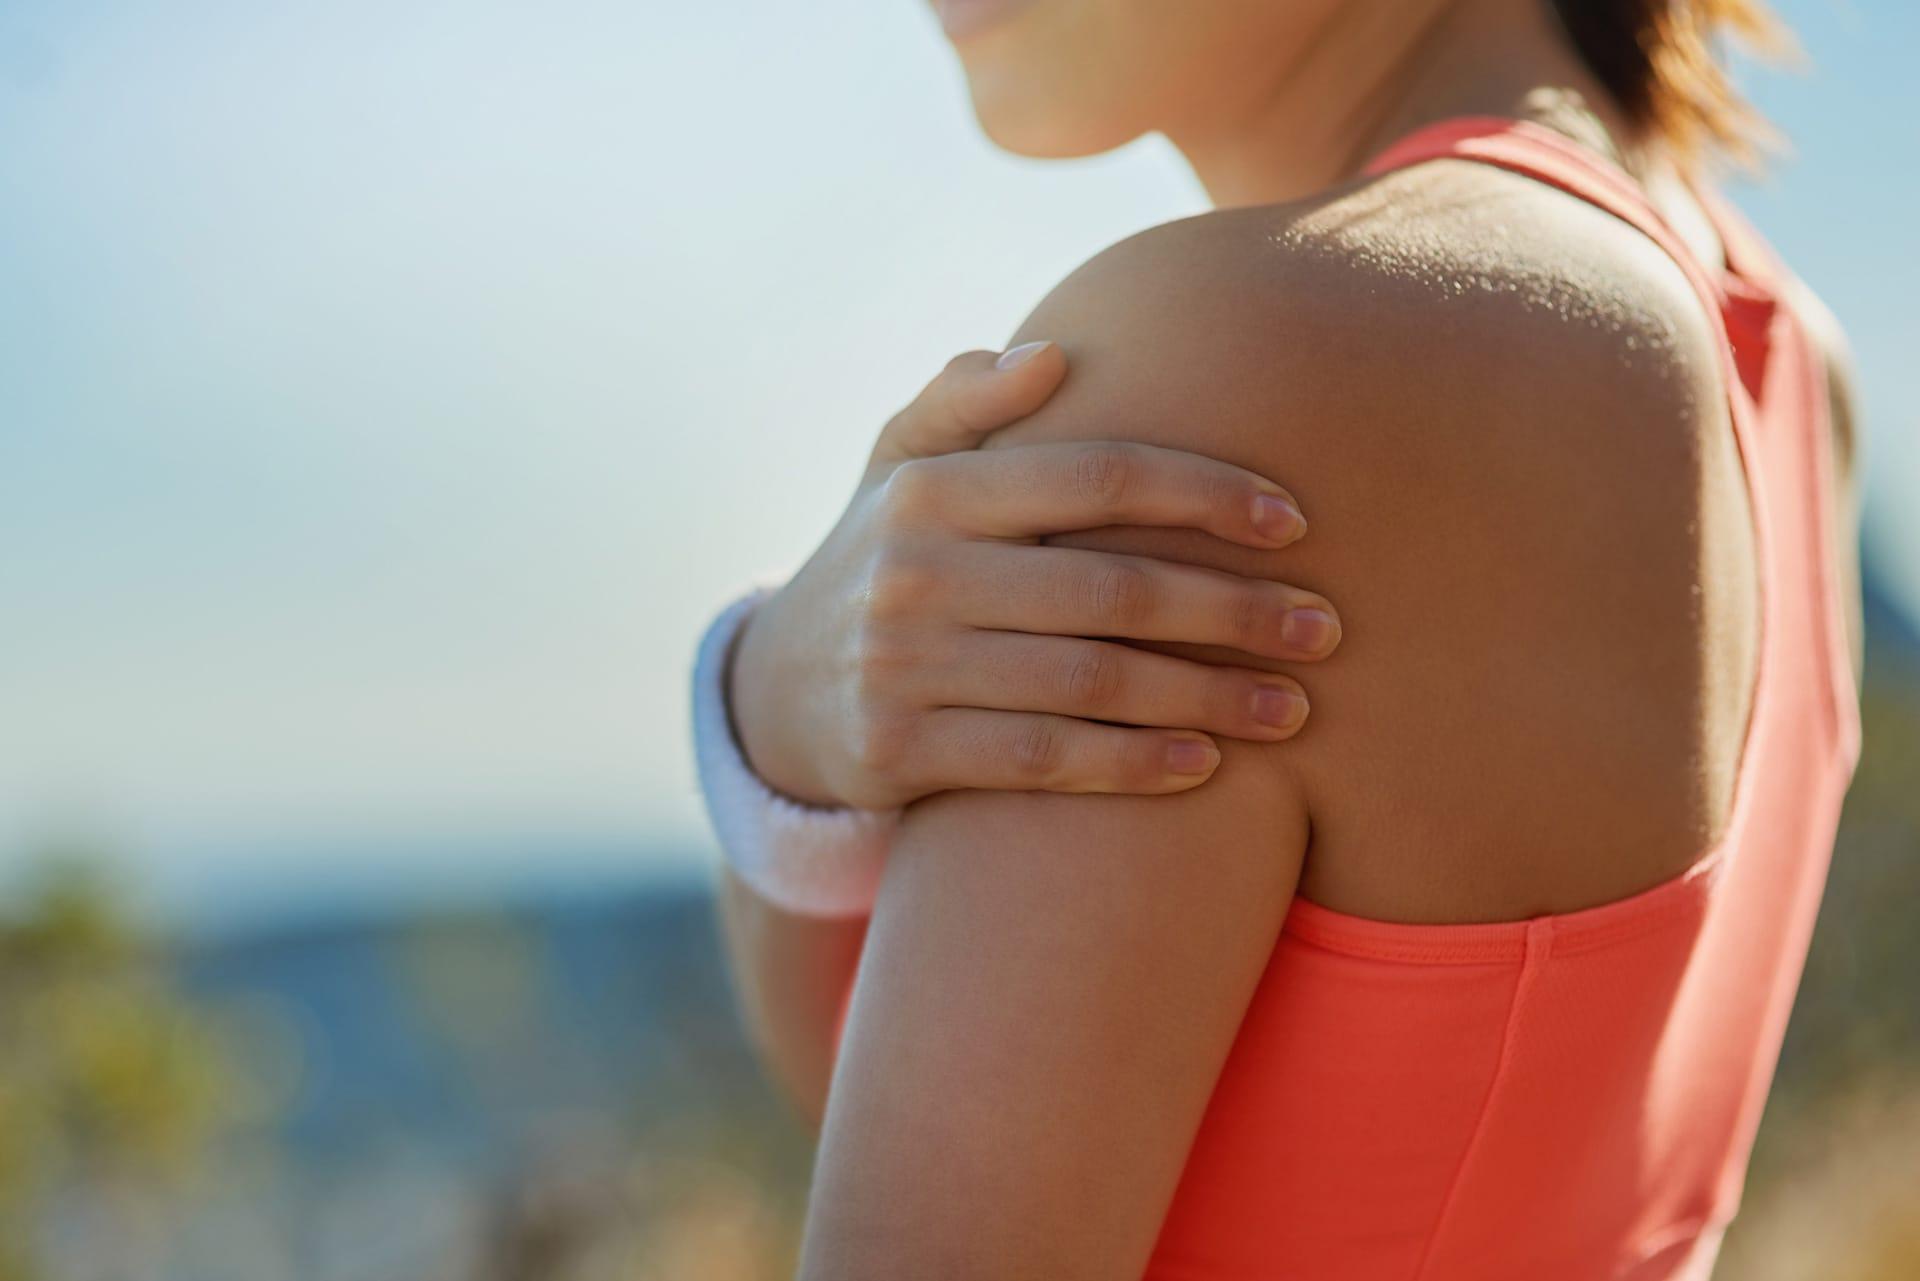 Oberarm muskel am knubbel Lipom: Ursachen,